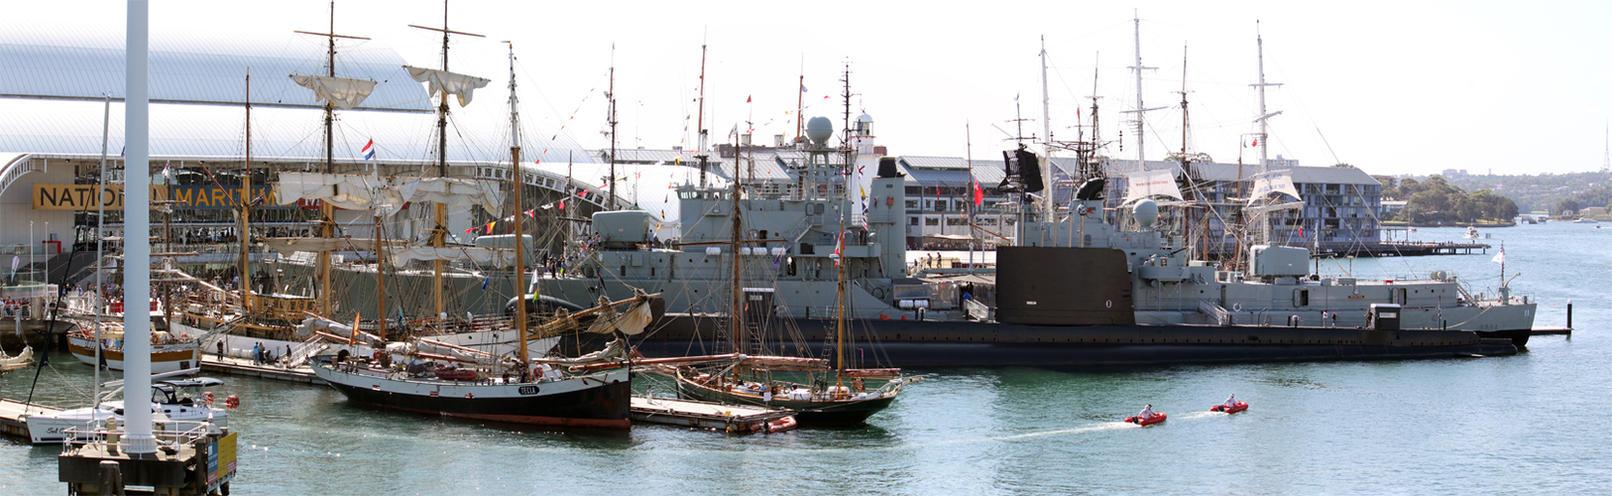 Australian National Maritime Museum Pano by TarJakArt